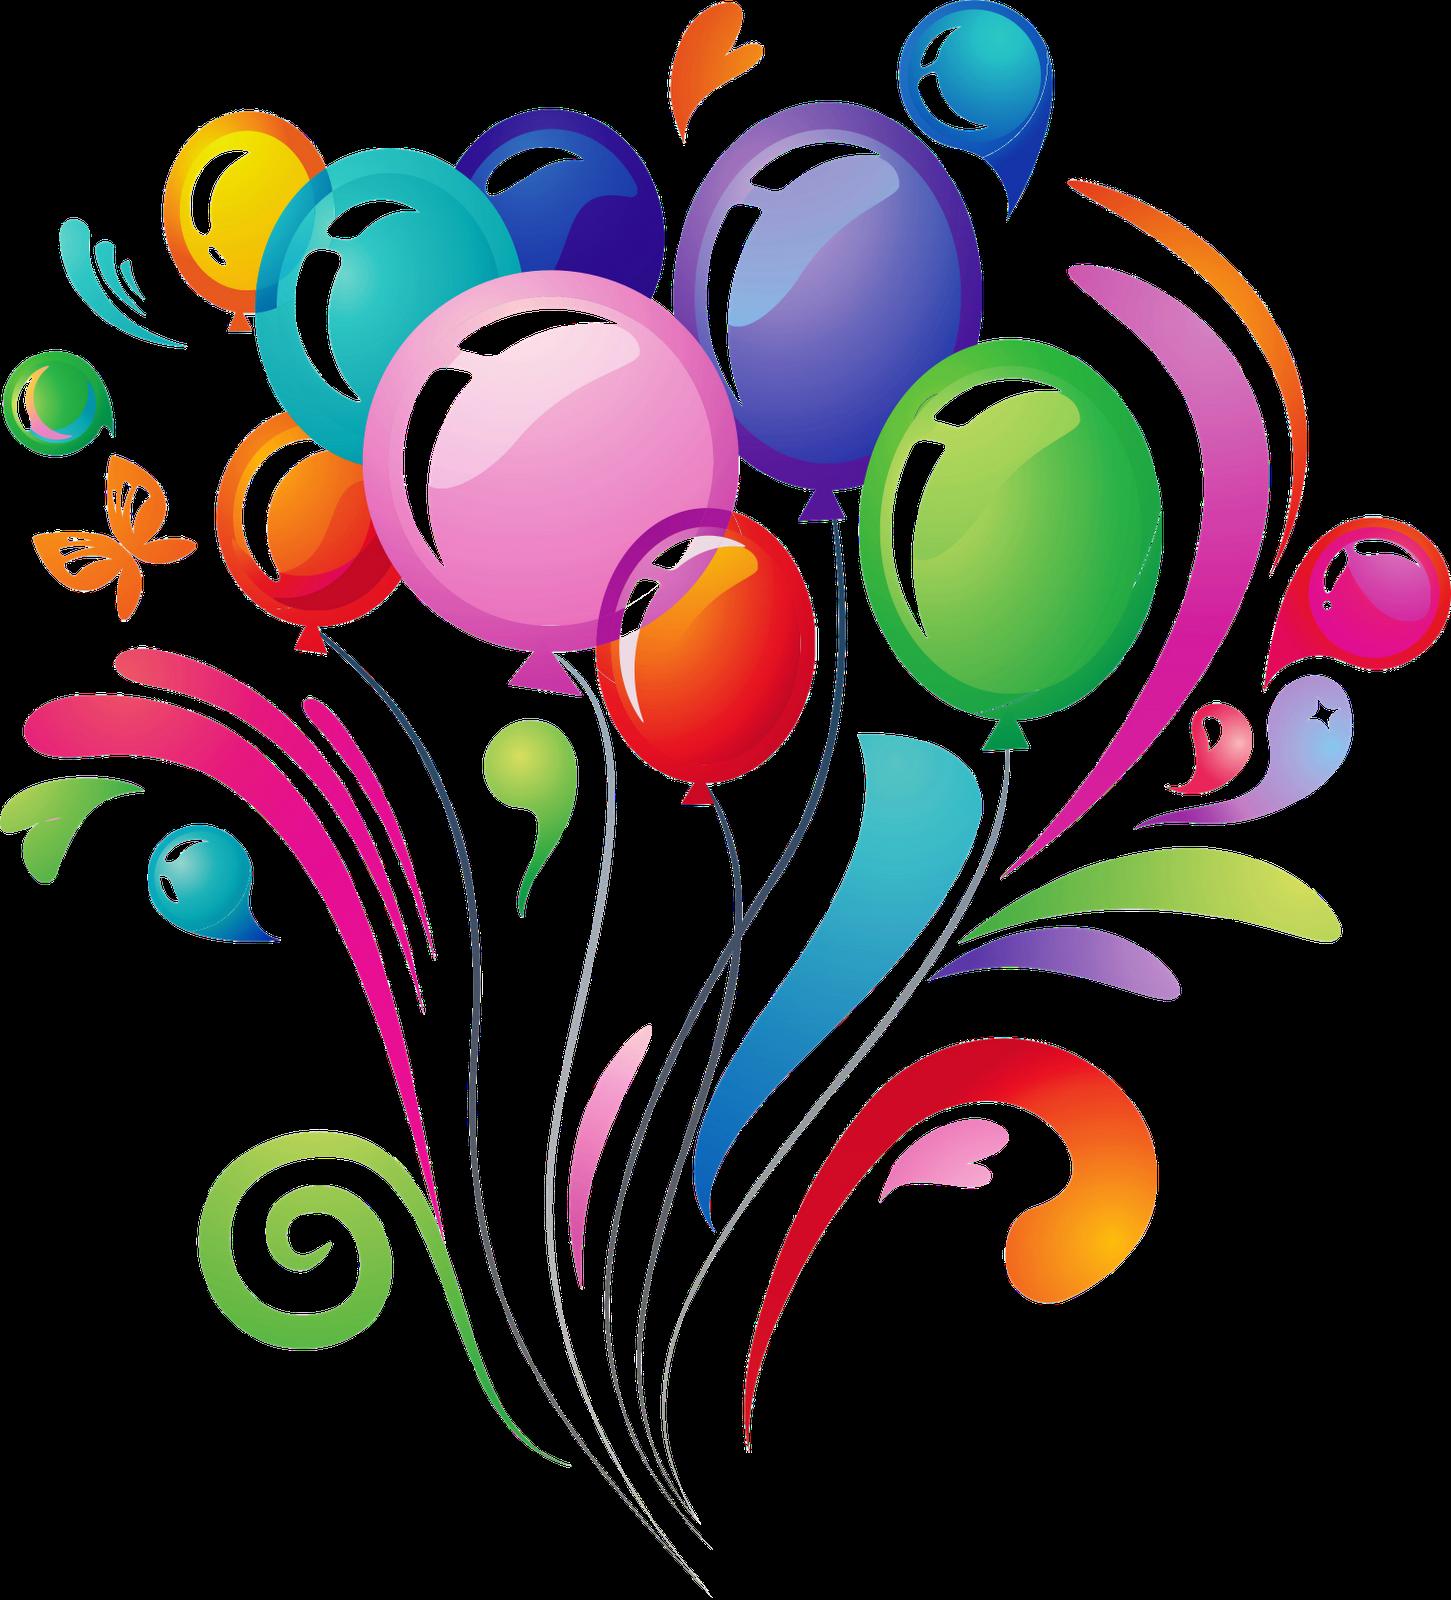 Balloon HD PNG - 91247